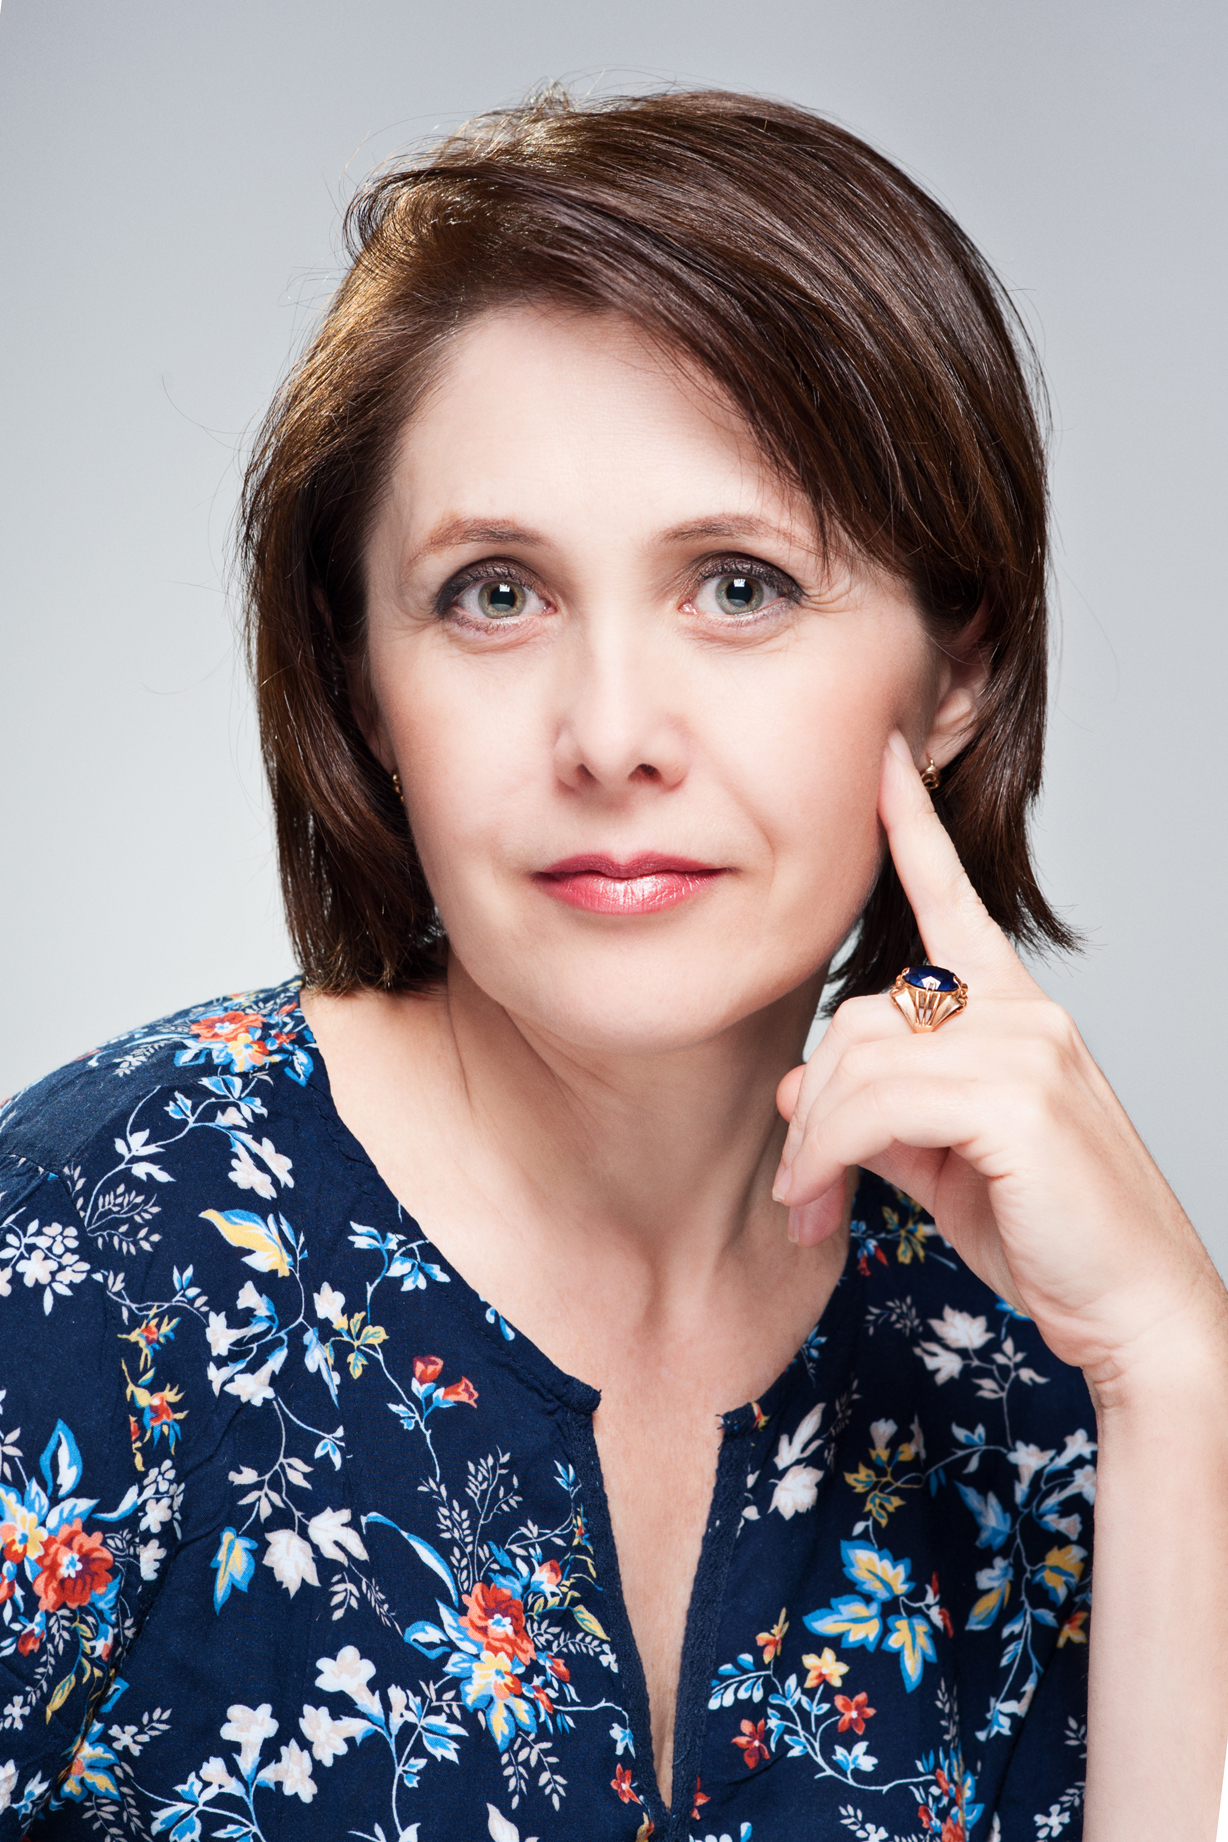 Ананьїна Ольга Юріївна